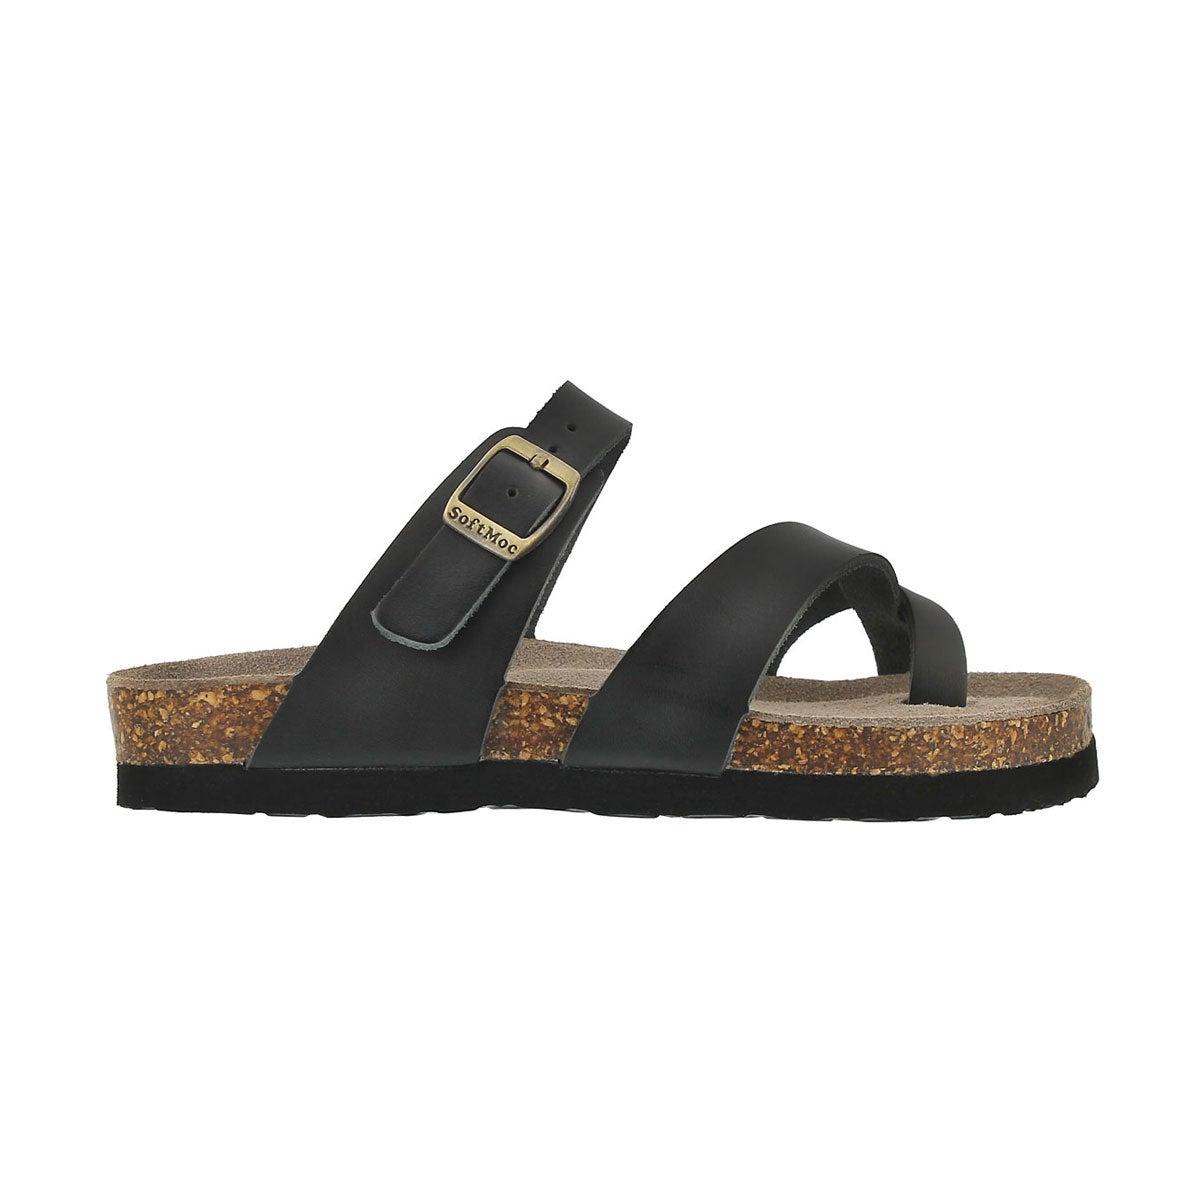 Grls Alicia black lthr toe loop sandal